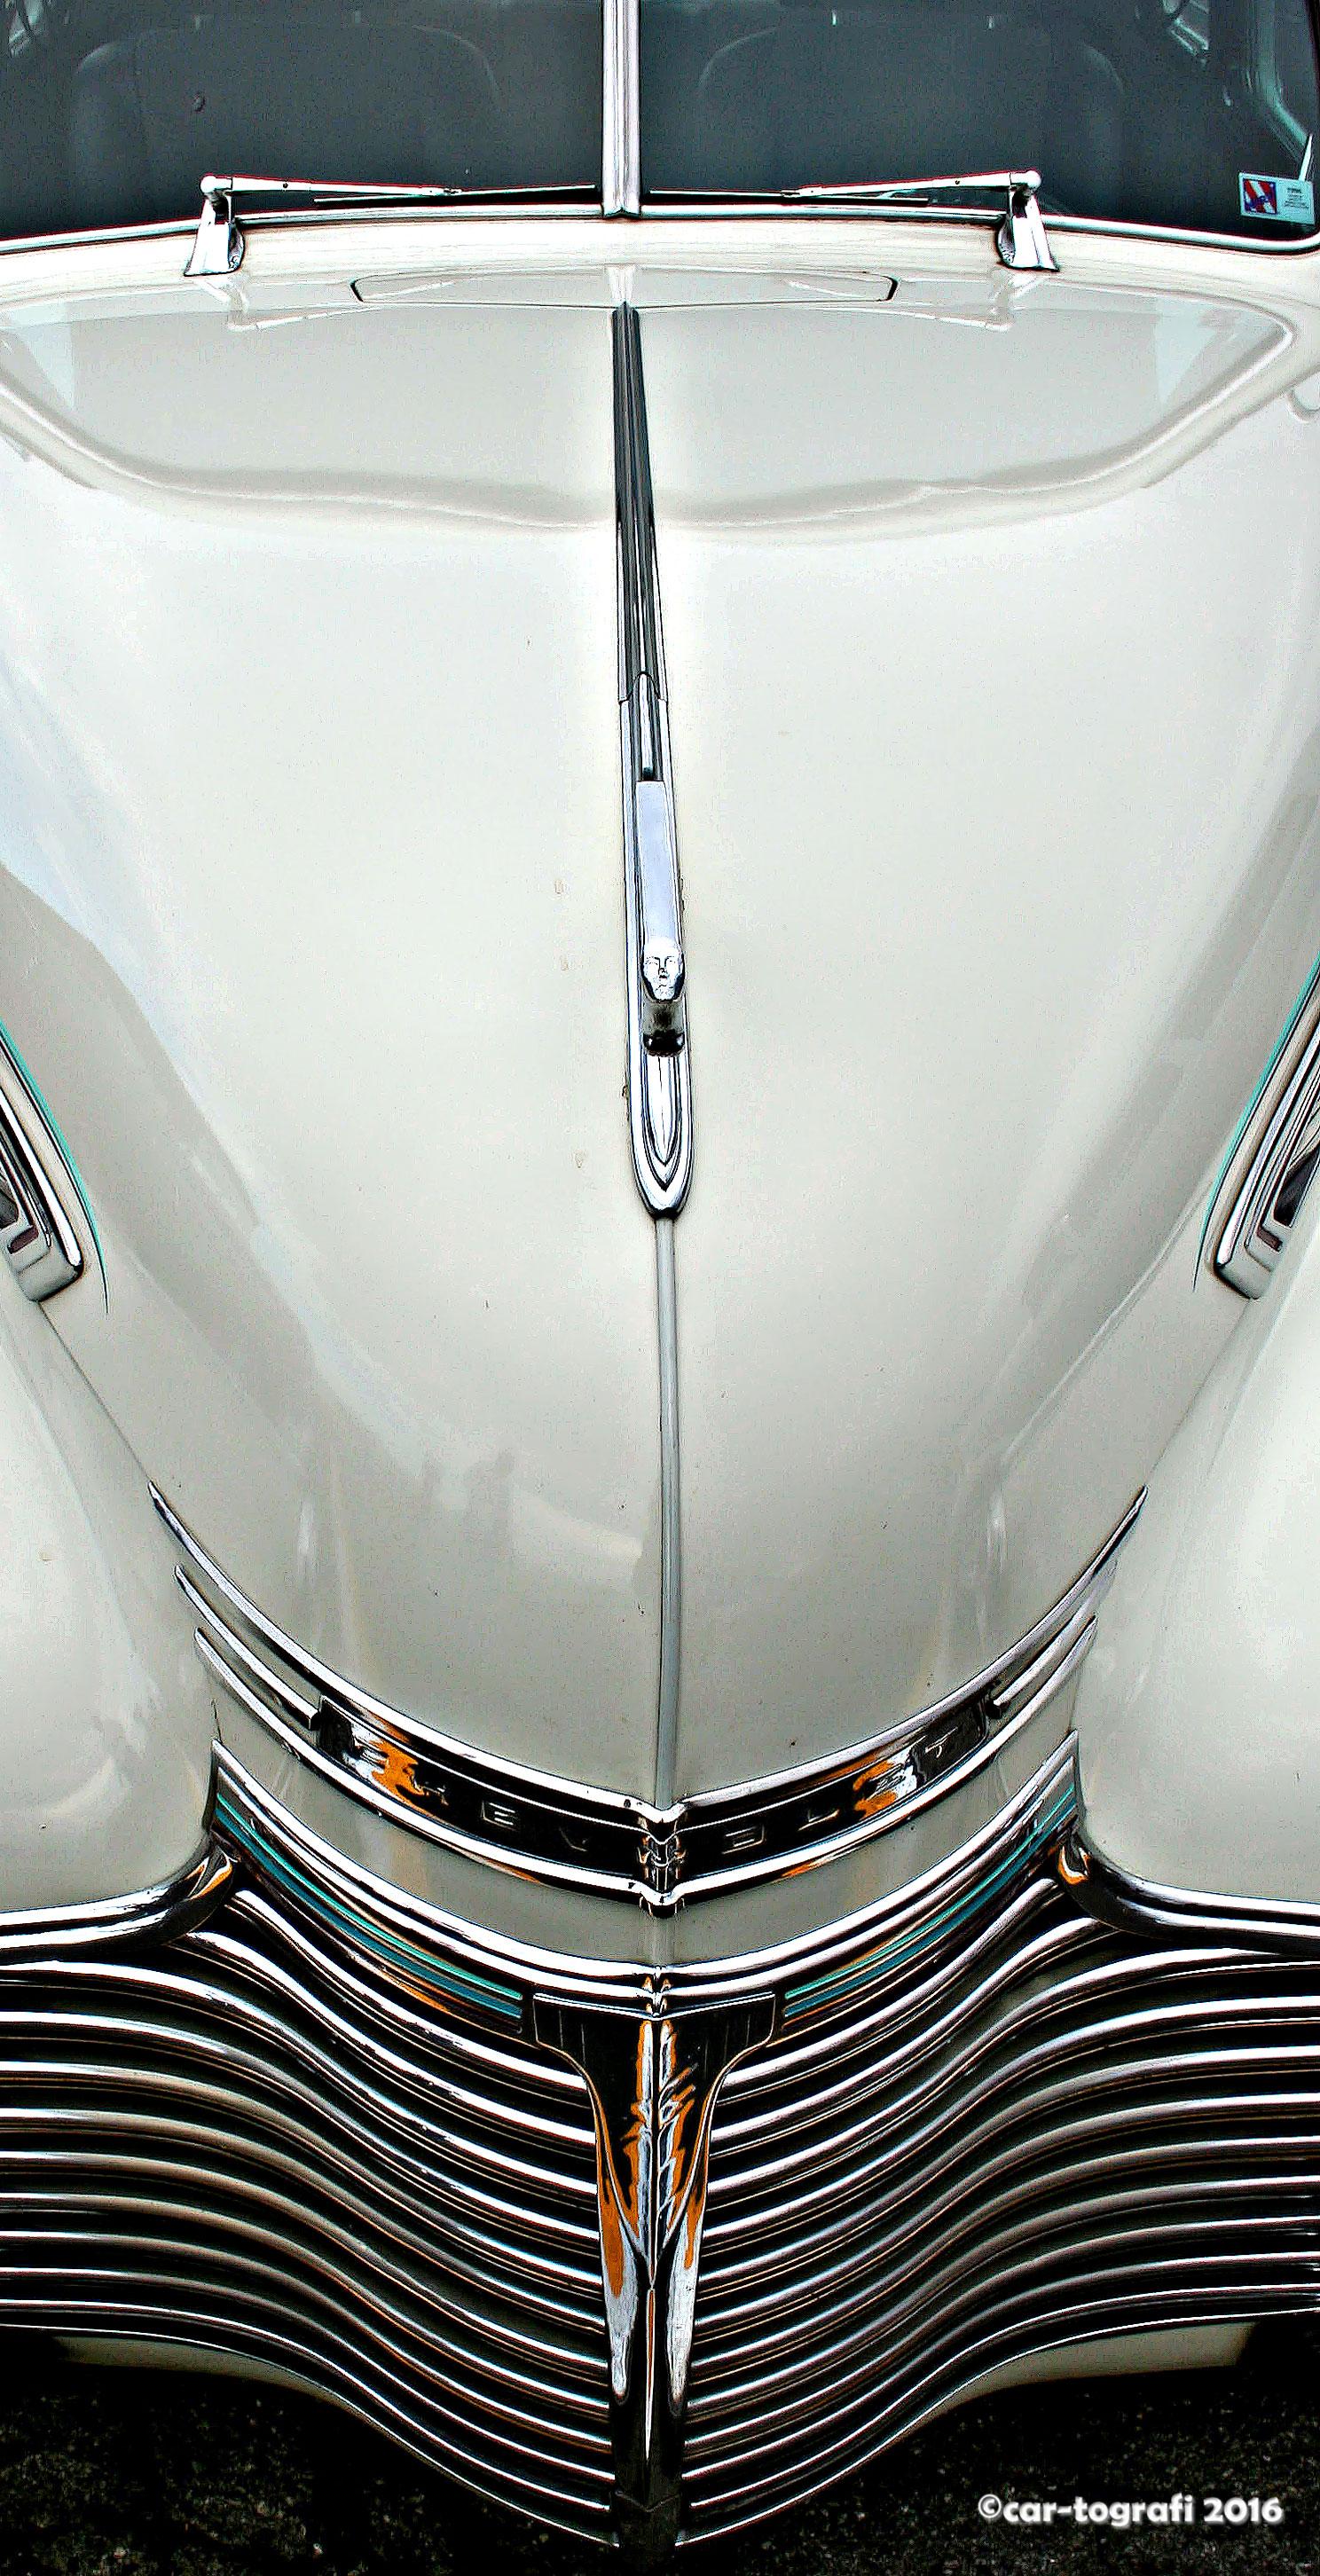 grill-creamy-dream-tones-car-tografi.jpg